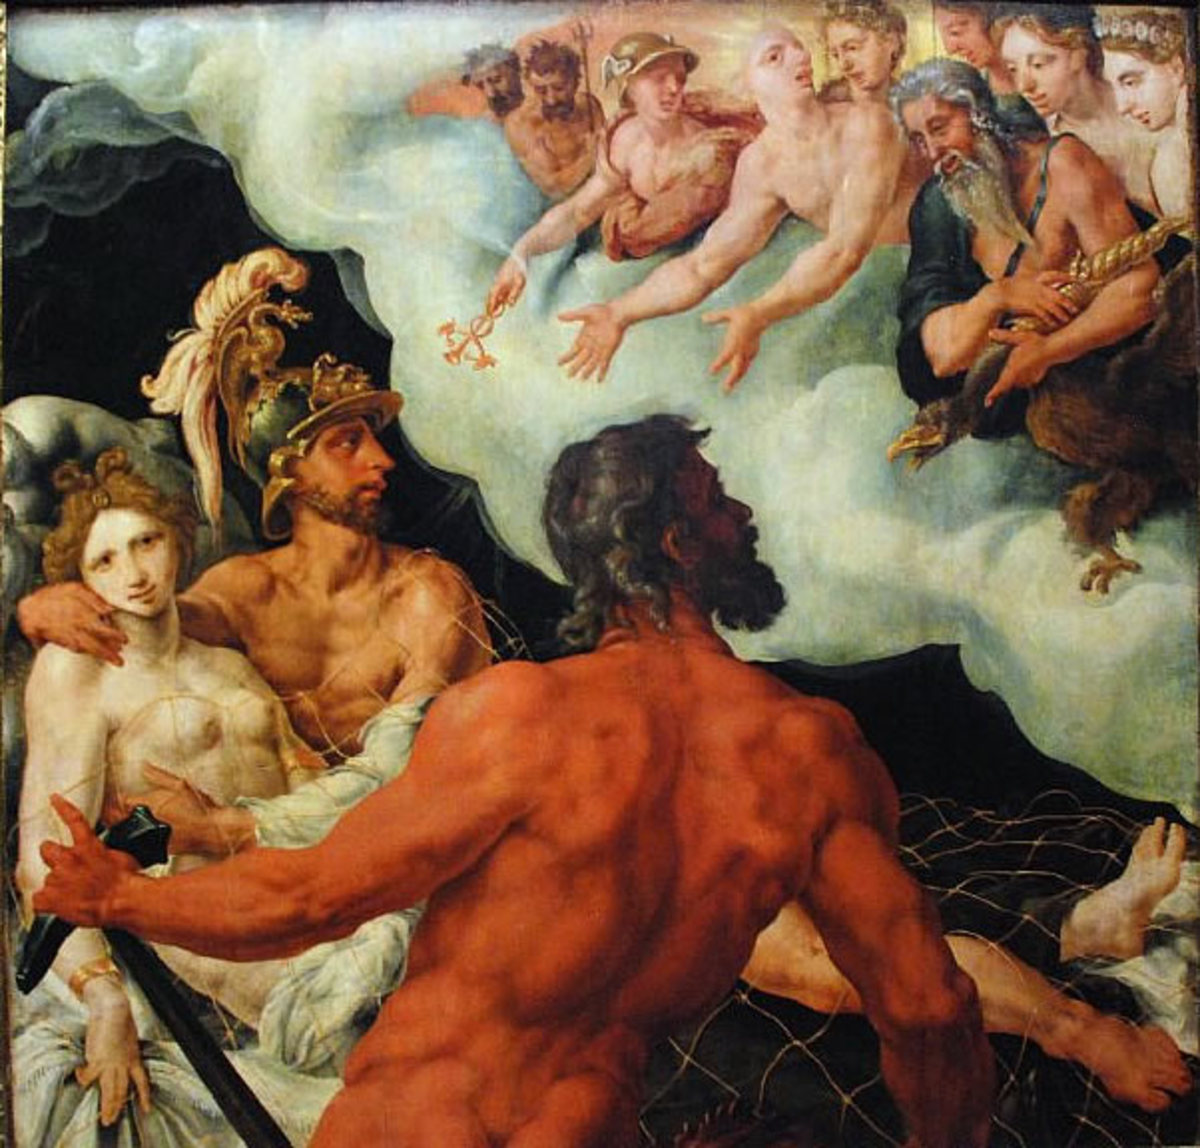 Venus, Vulcan and Mars by Maarten van Heemskerck, 1540.